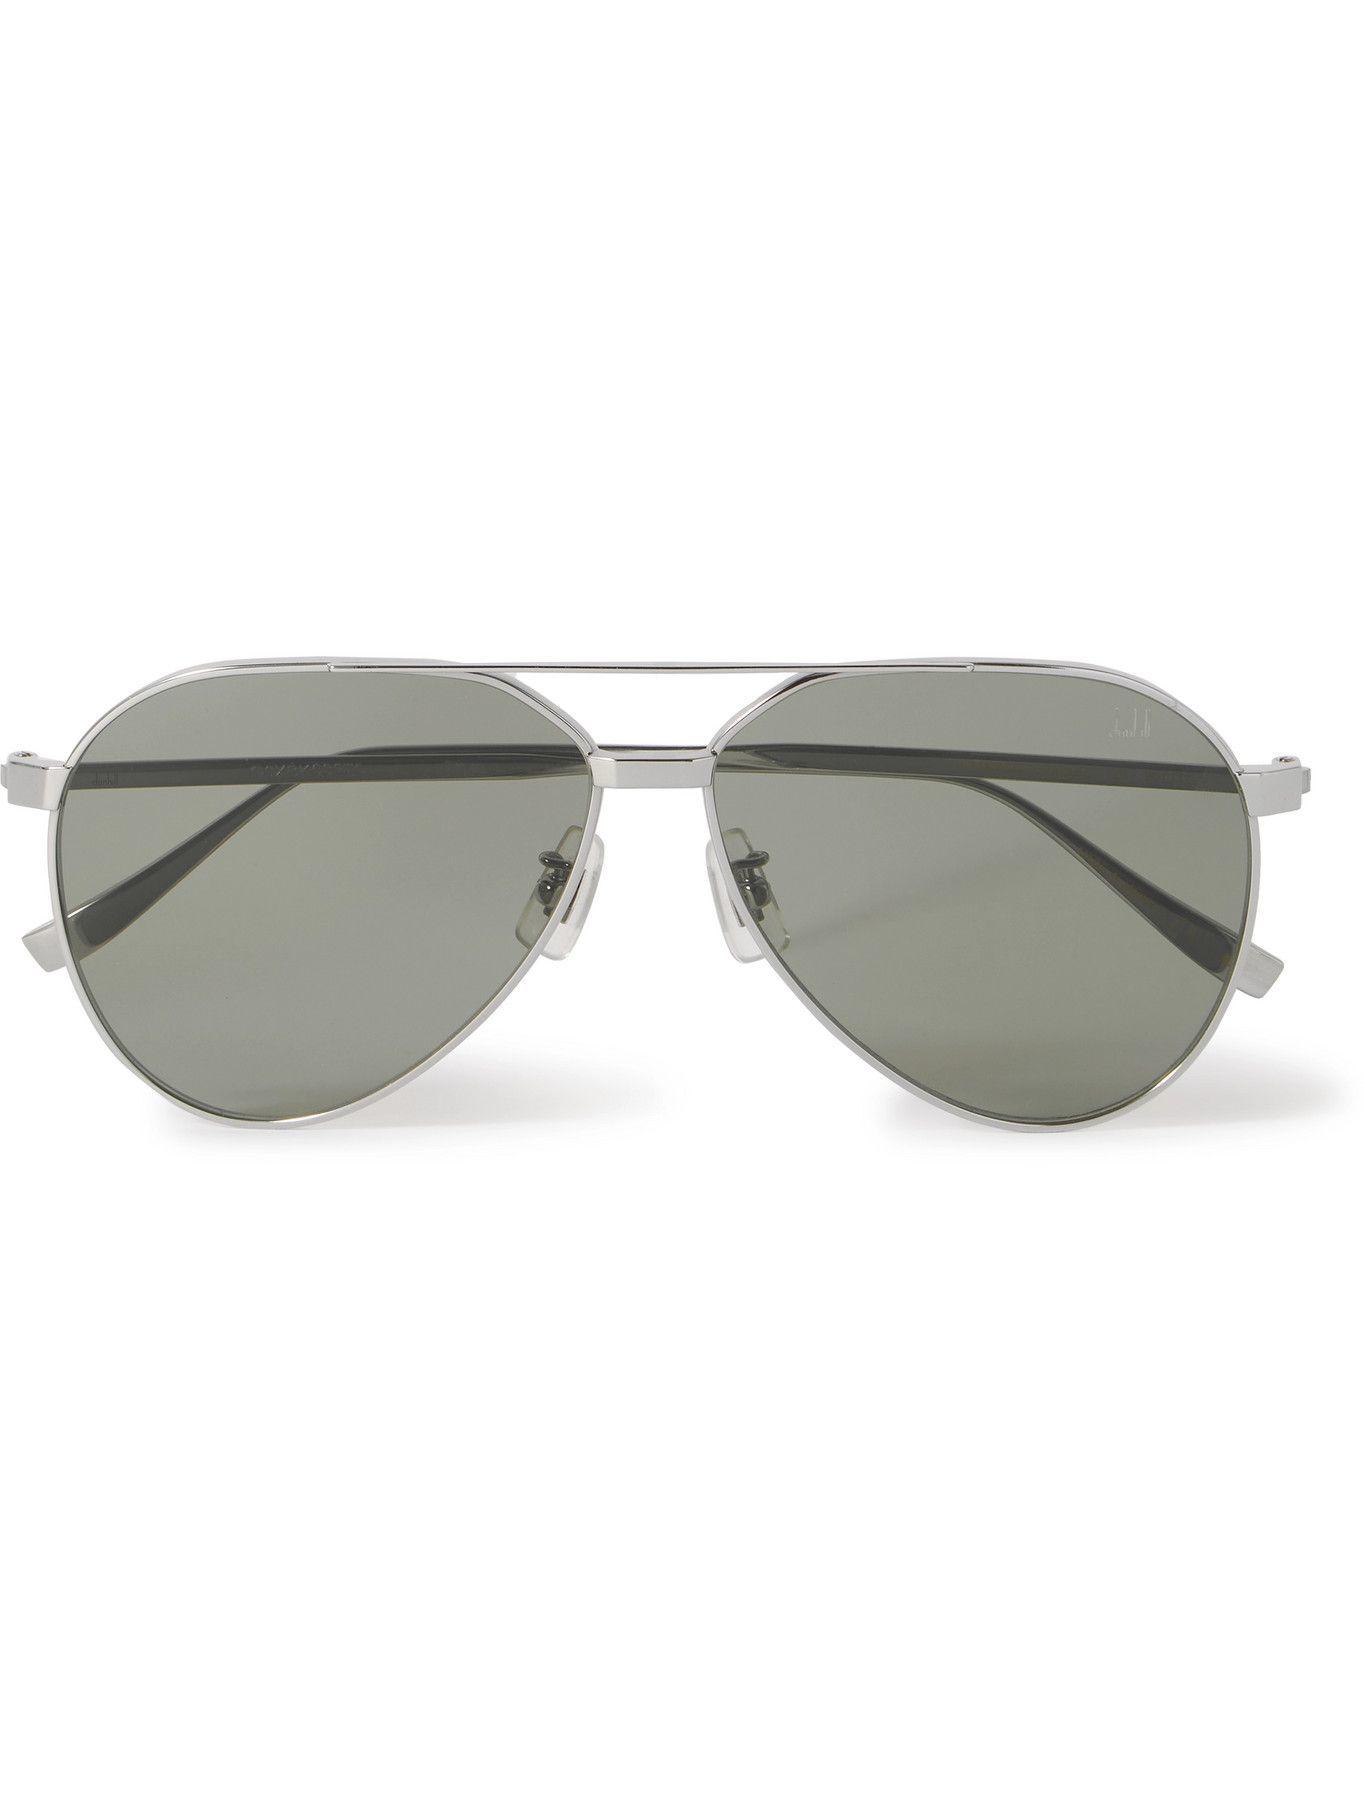 DUNHILL - Aviator-Style Silver-Tone Sunglasses